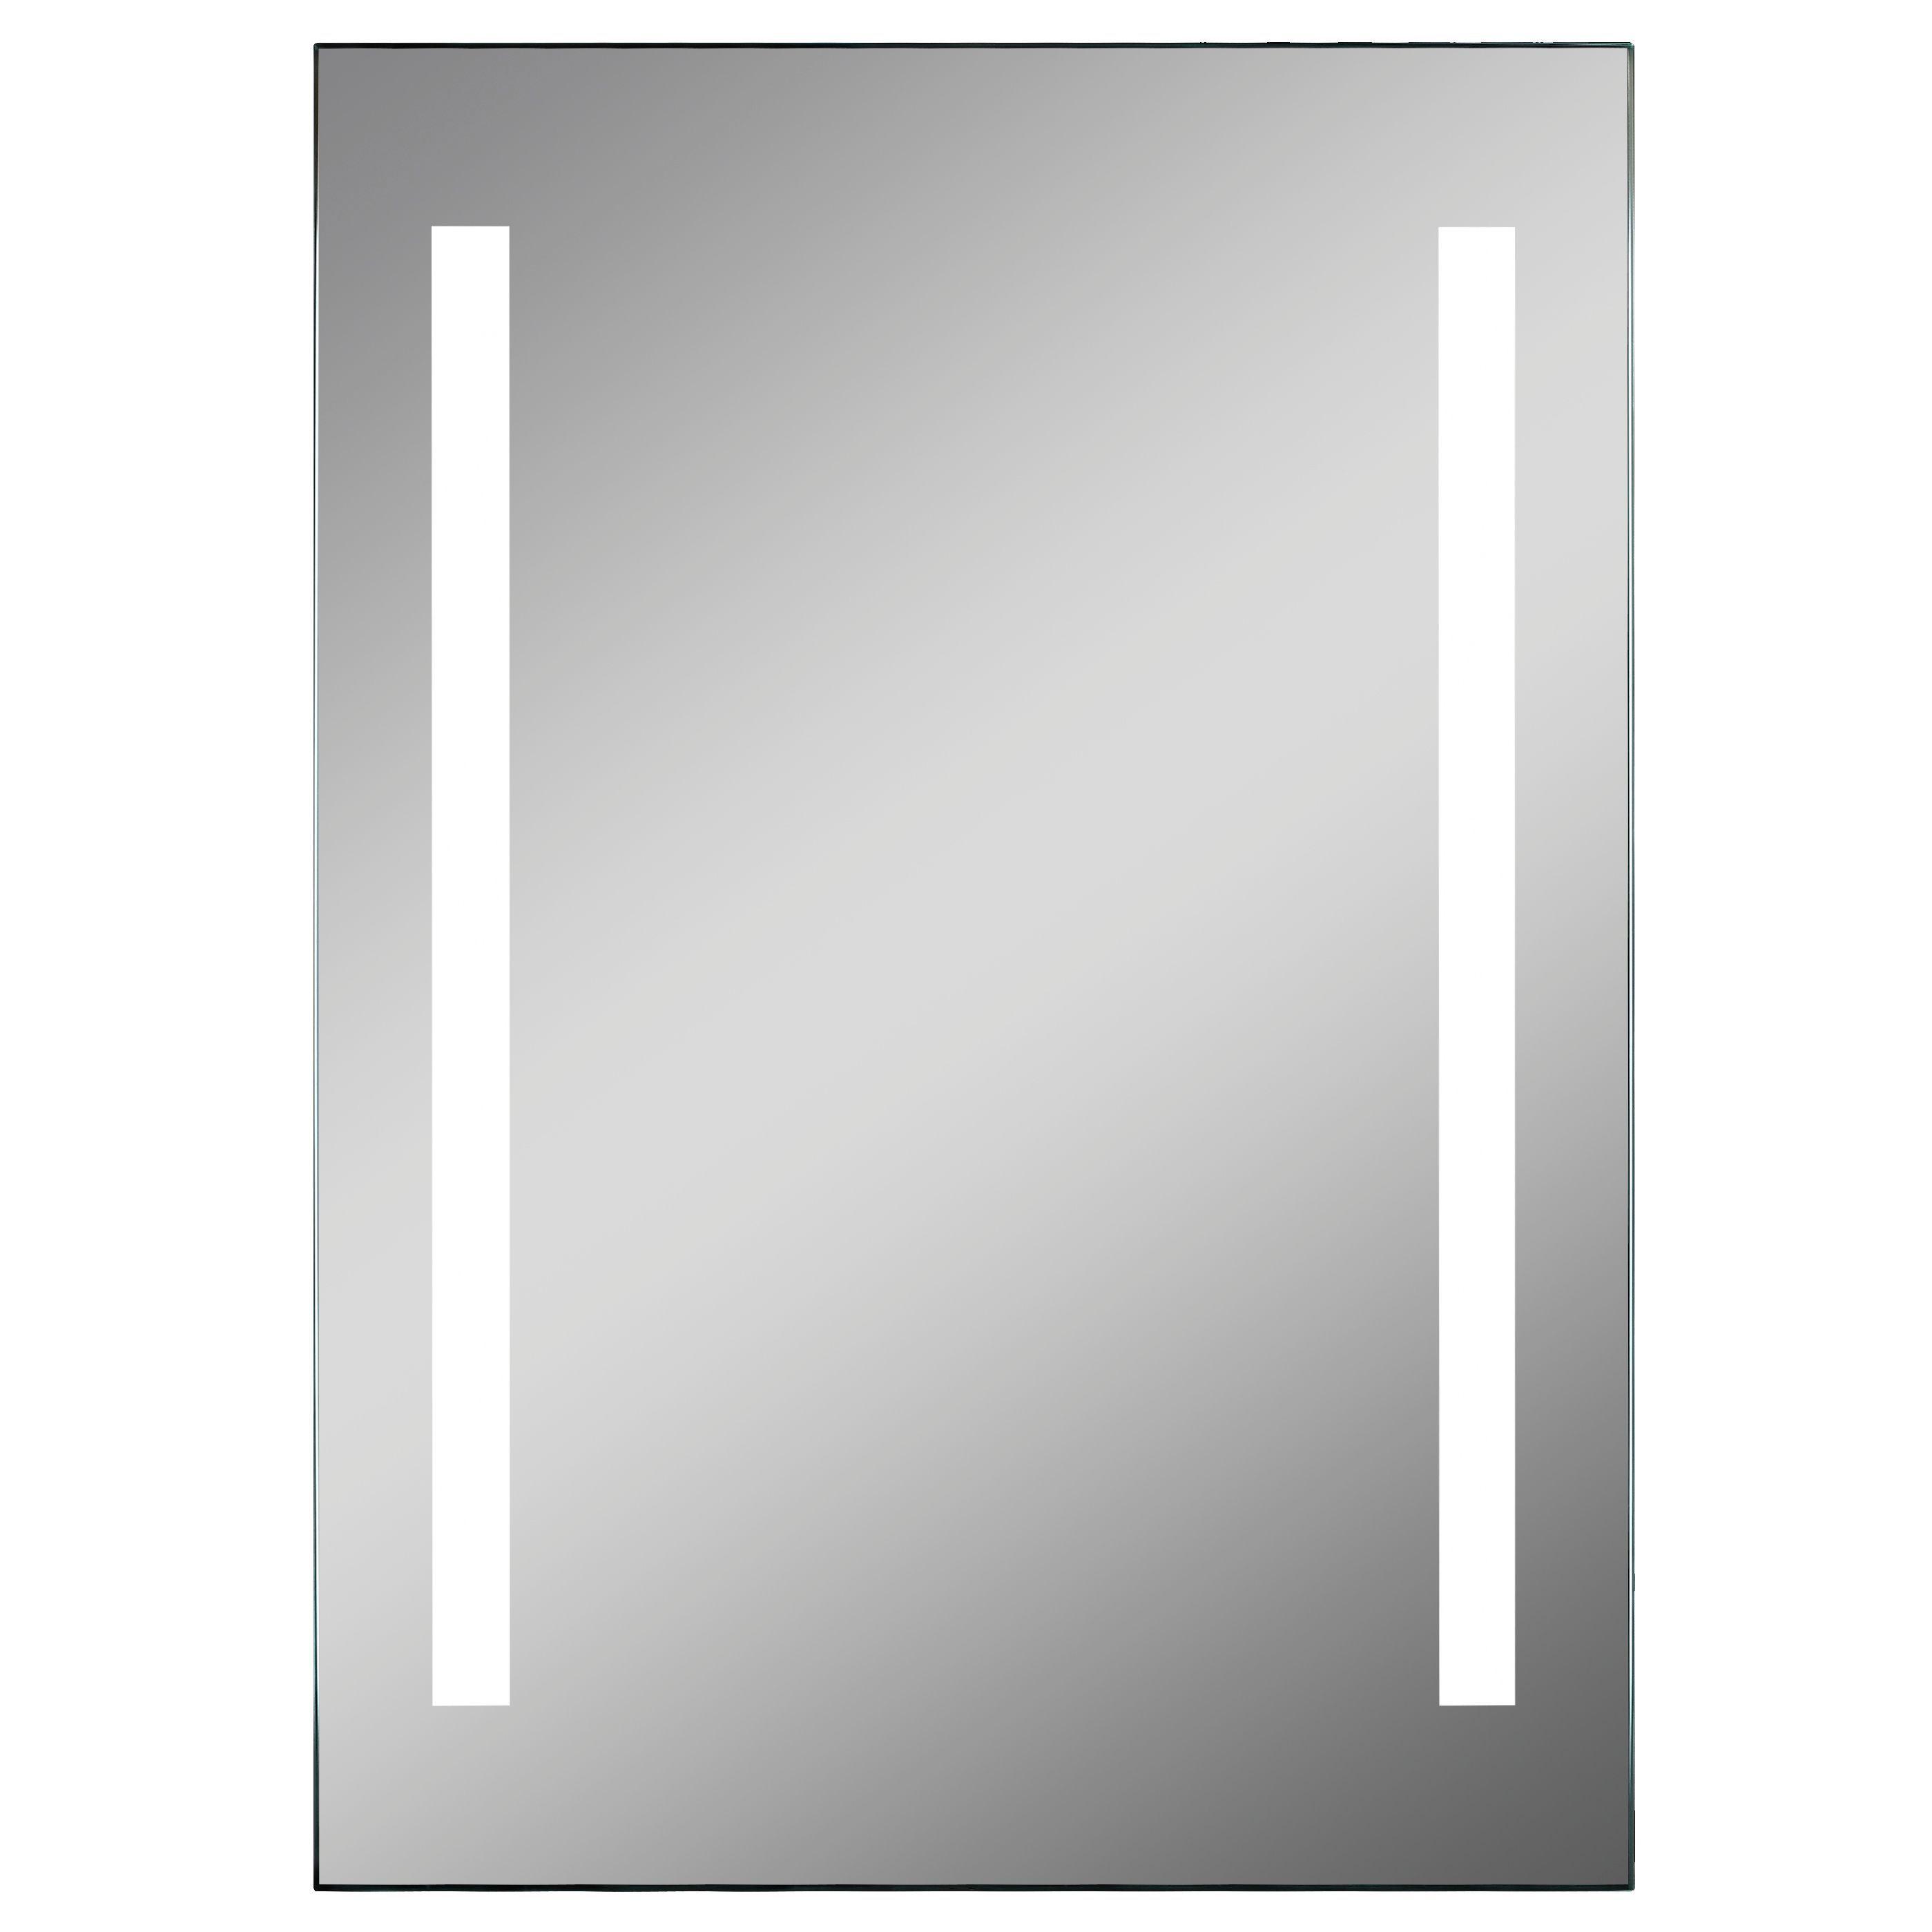 Bathroom Shaver Lights B&Q lumino pesanta illuminated bathroom rectangular mirror with shaver